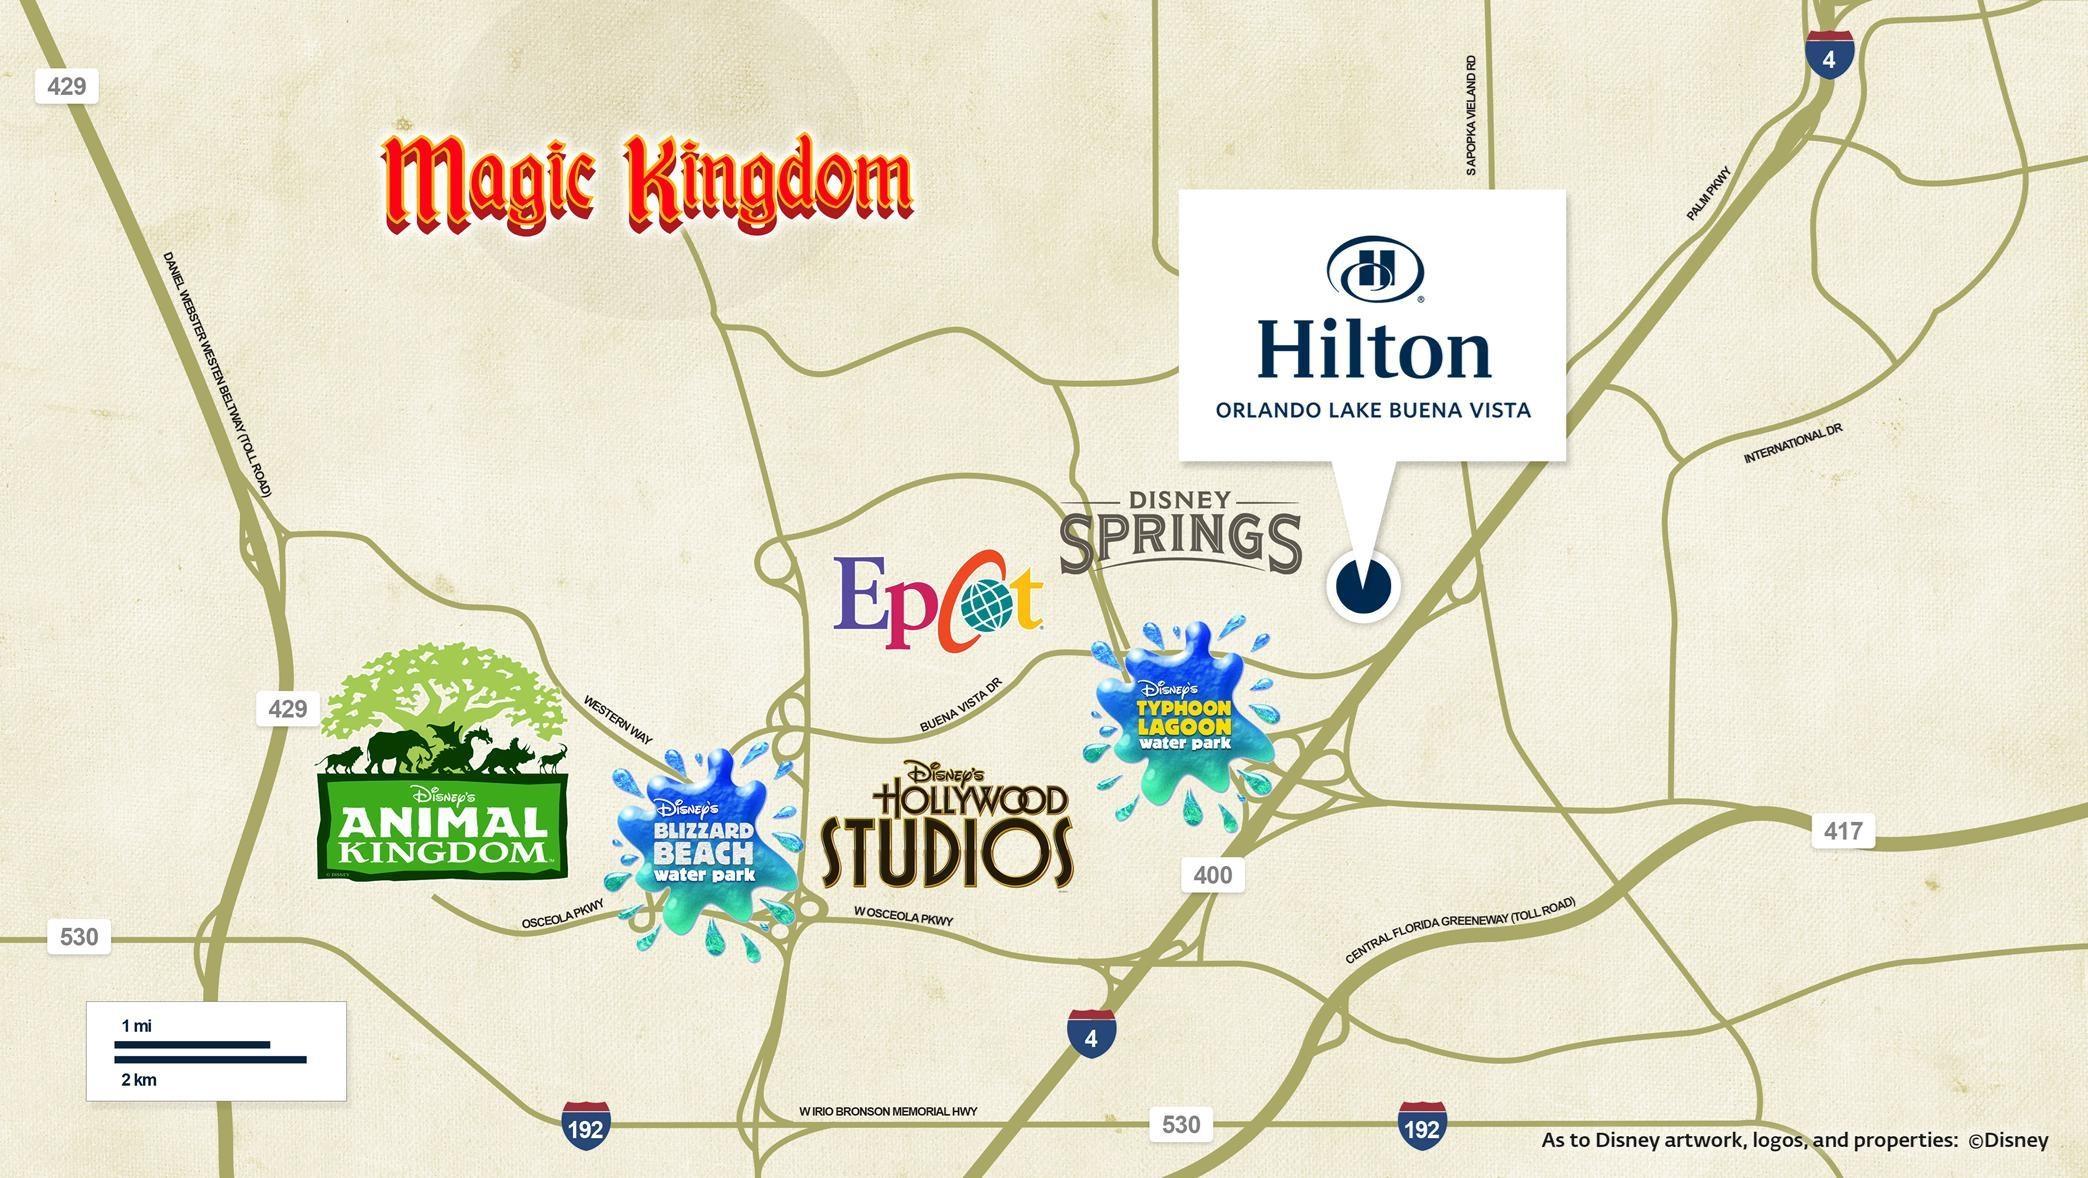 Hilton Orlando Lake Buena Vista Disney Springs Area Hotel - Hilton properties map